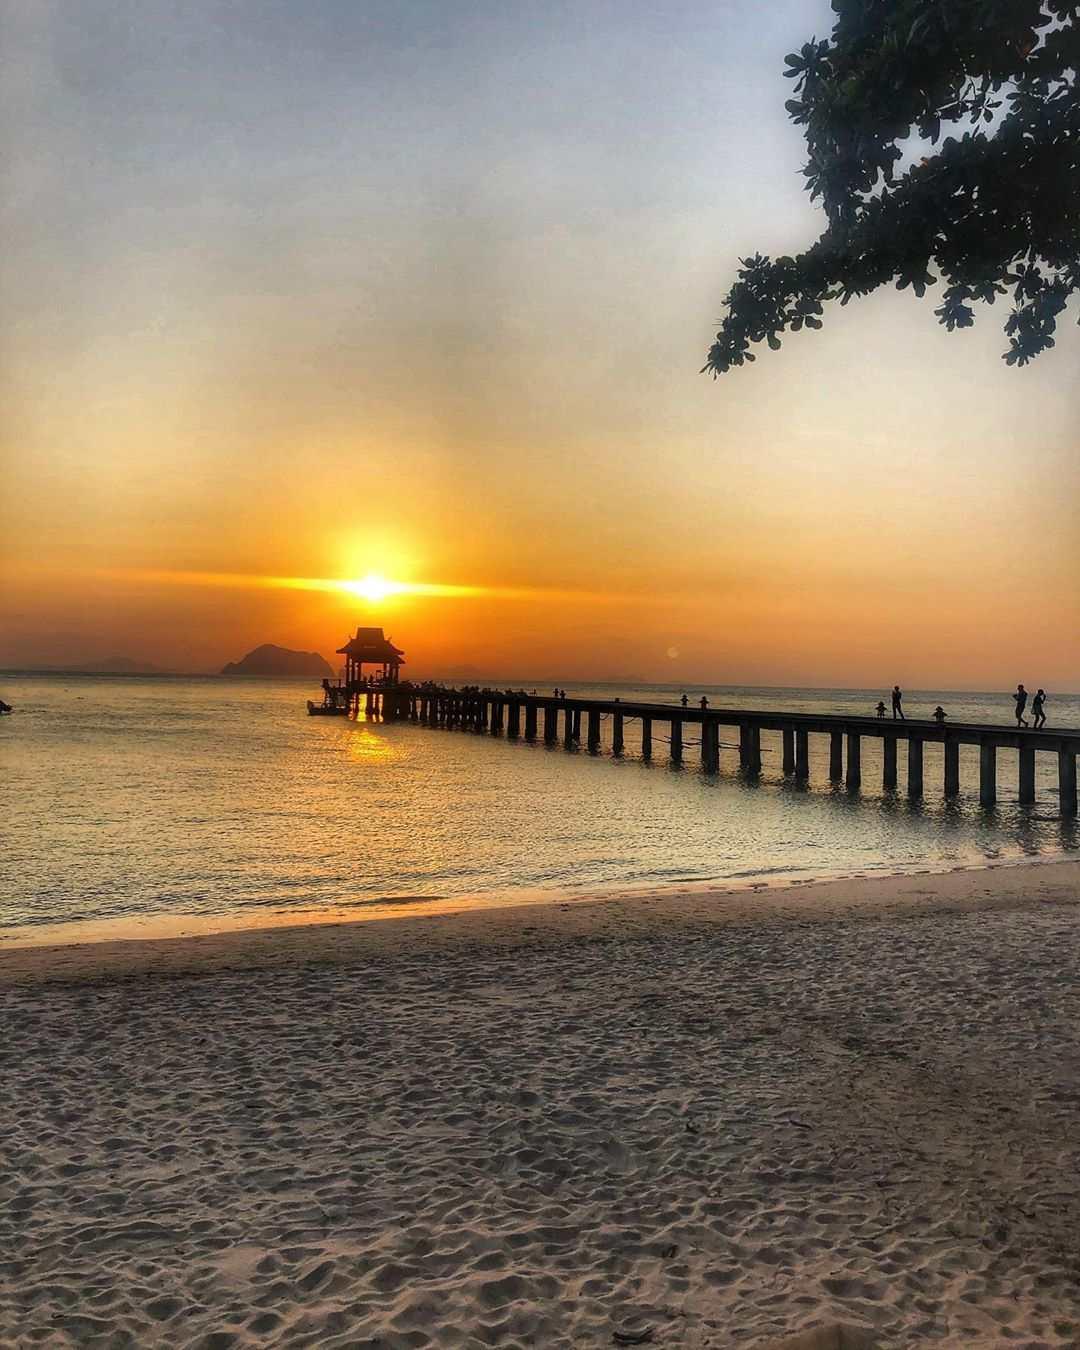 Jetinn Teppan Pier op Koh Yao Yai